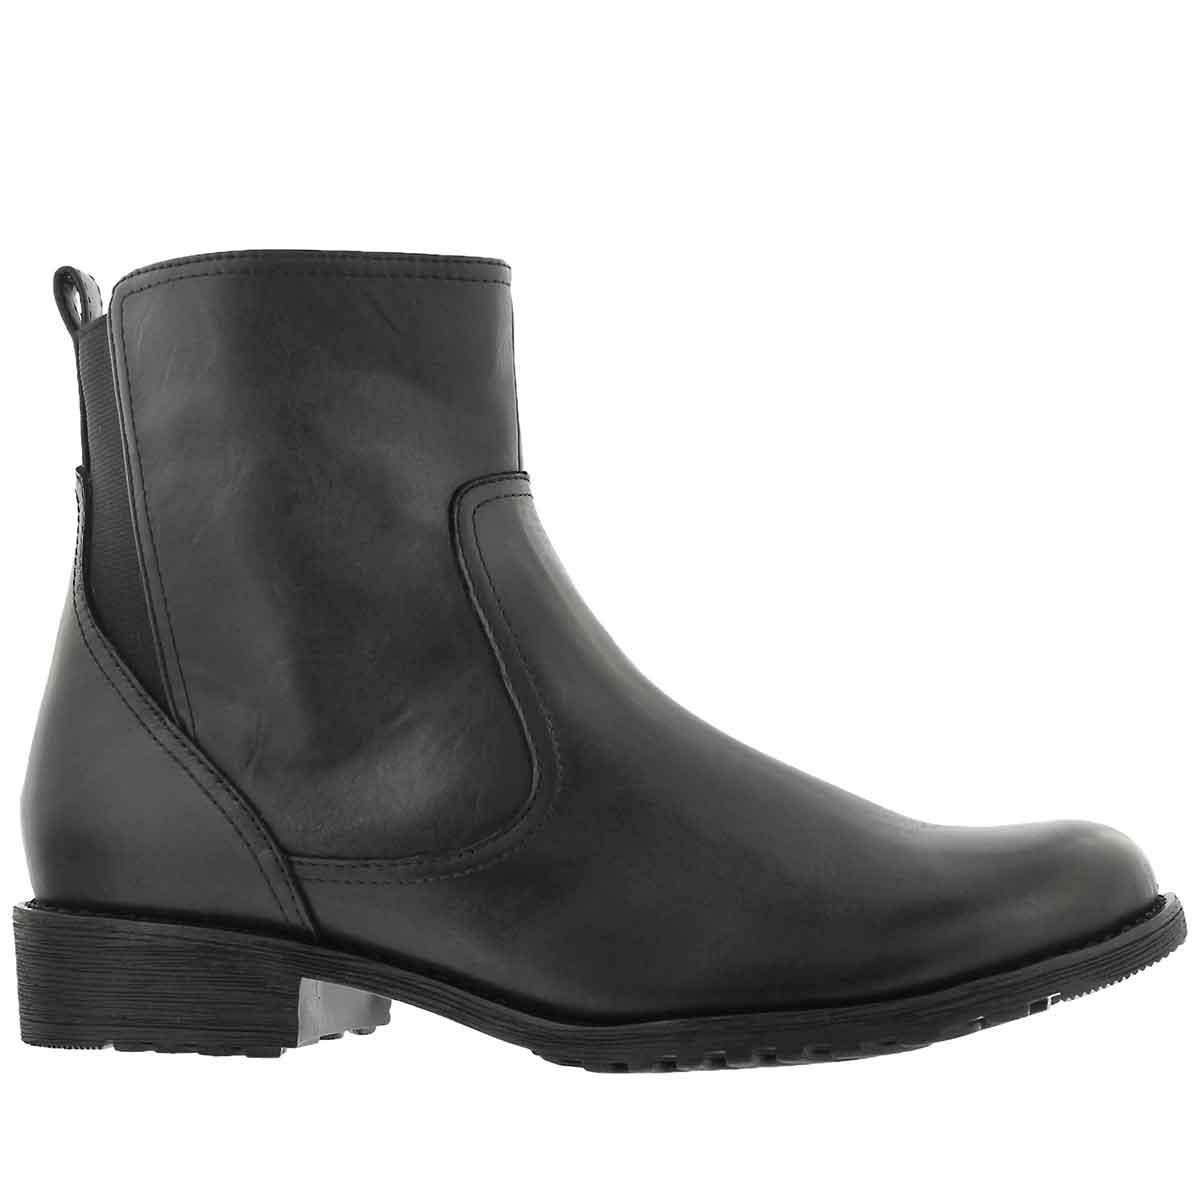 Women's MADDIE MADISON IIV blk waterproof boots